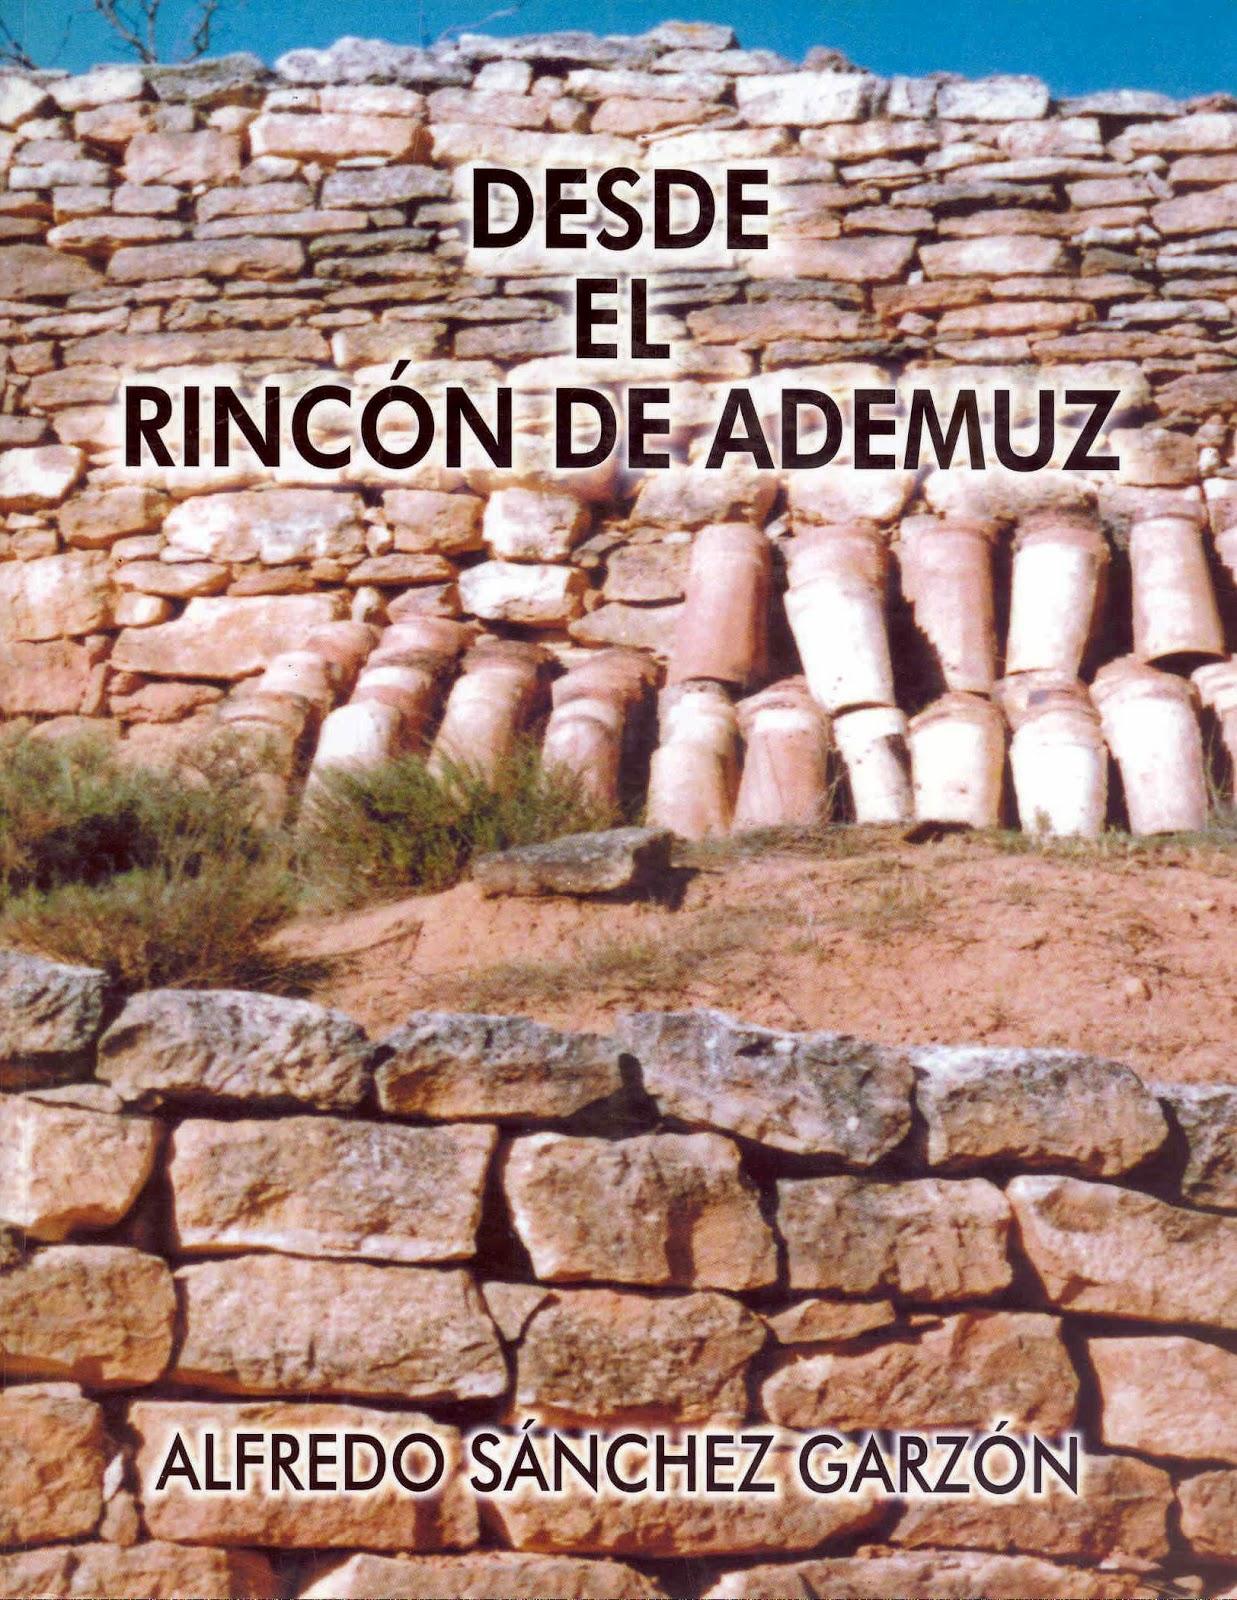 desde-rincon-ademuz-alfredo-sanchez-garzon